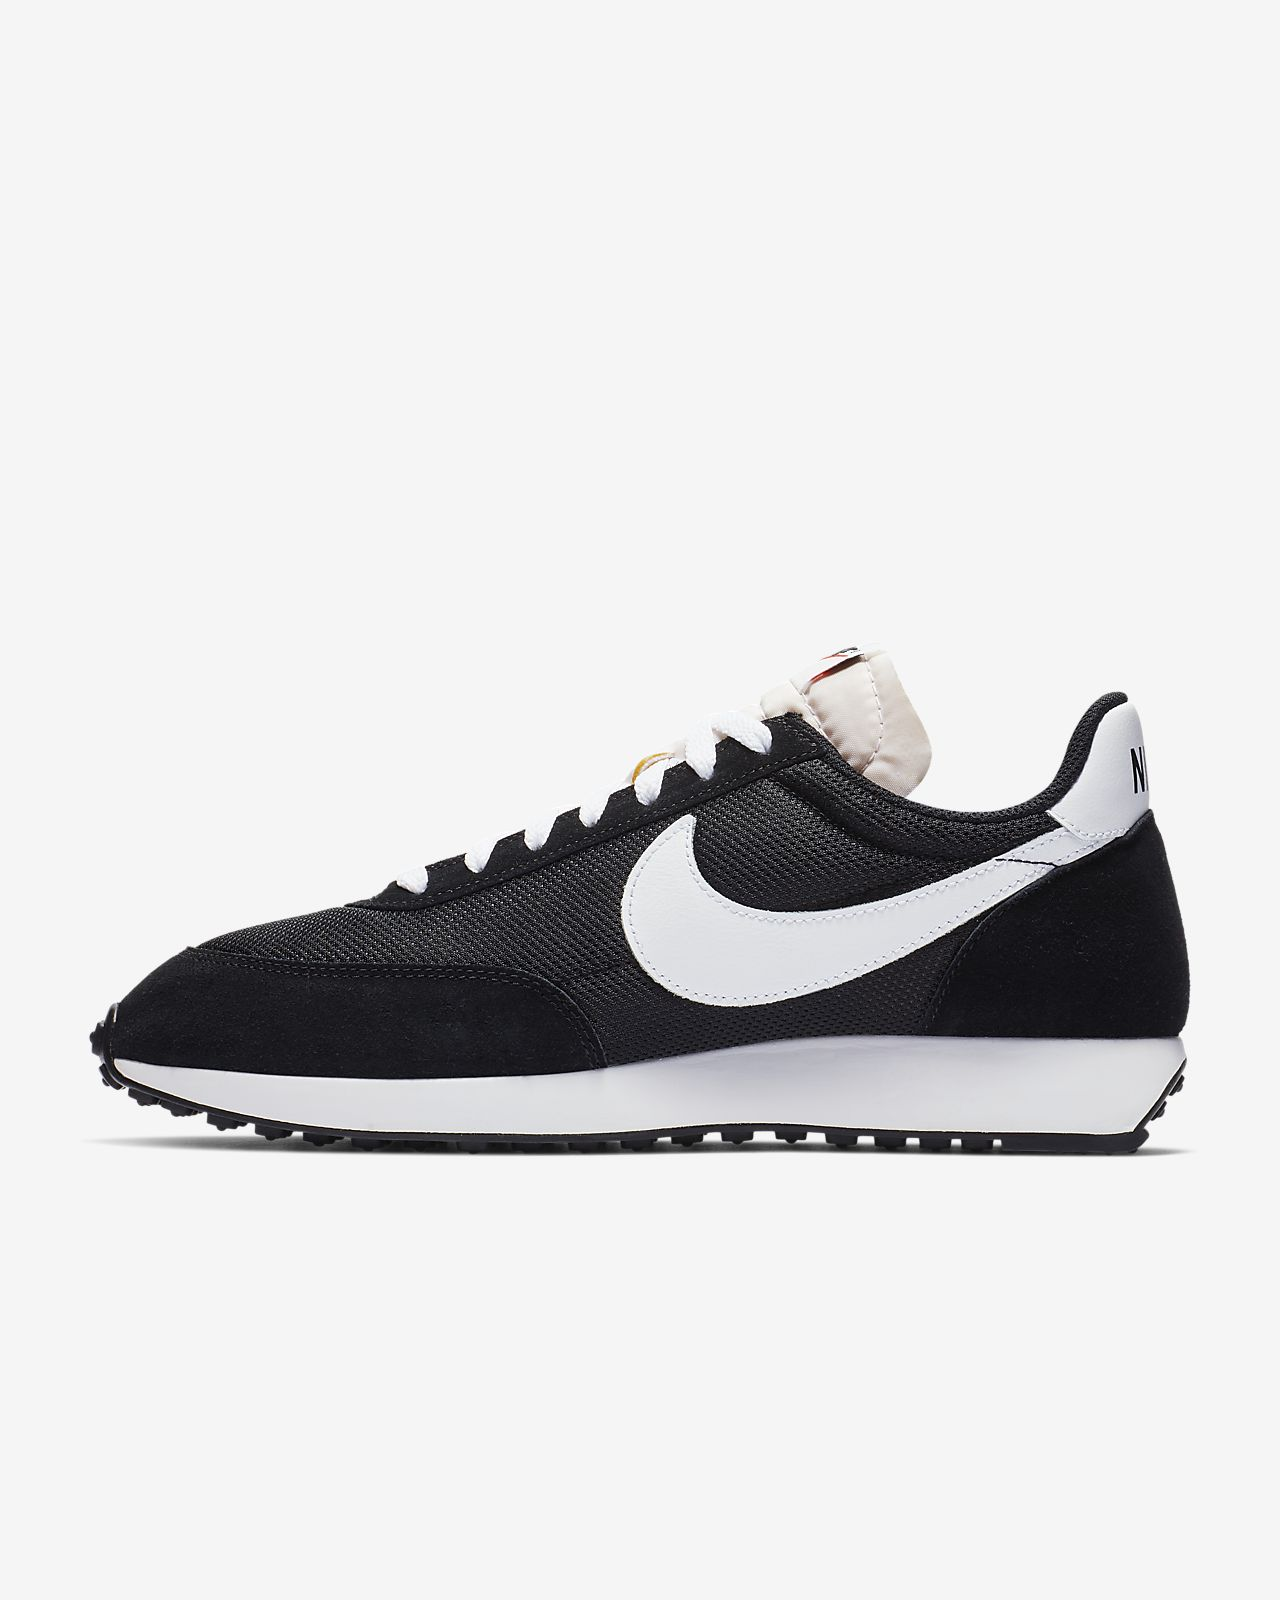 superior quality 91ebd 50800 ... Sko Nike Air Tailwind 79 för män